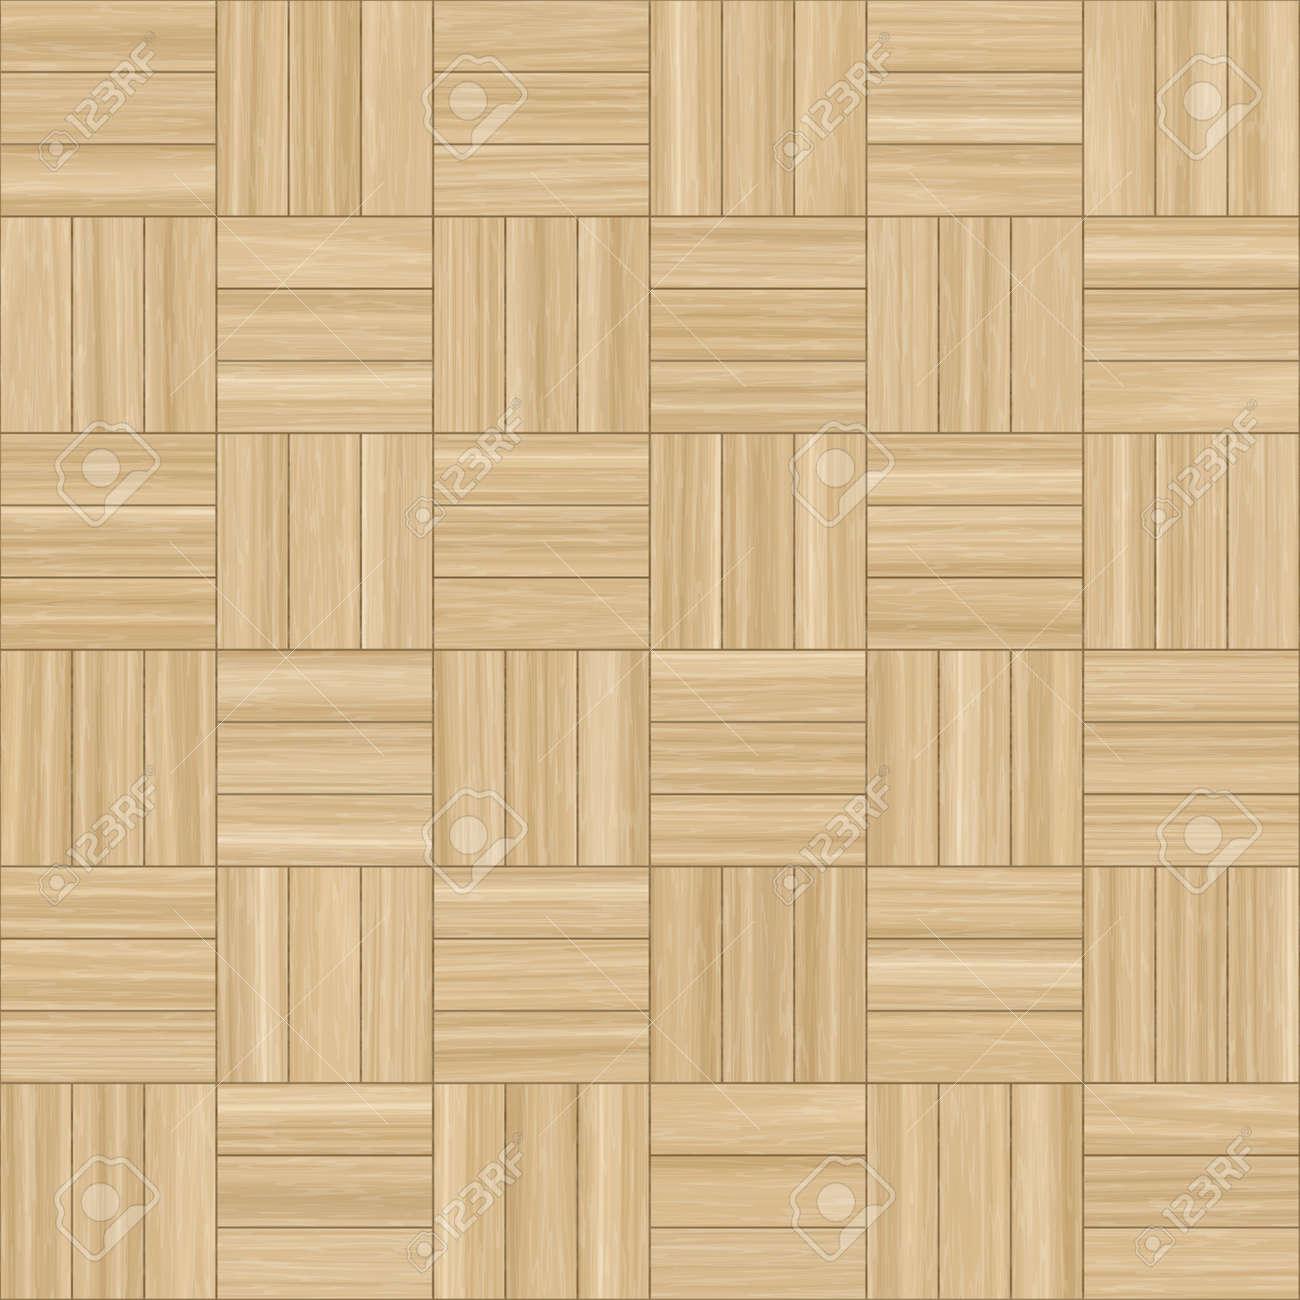 Parquet wood flooring seamless texture tile stock photo picture parquet wood flooring seamless texture tile stock photo 13014863 dailygadgetfo Image collections